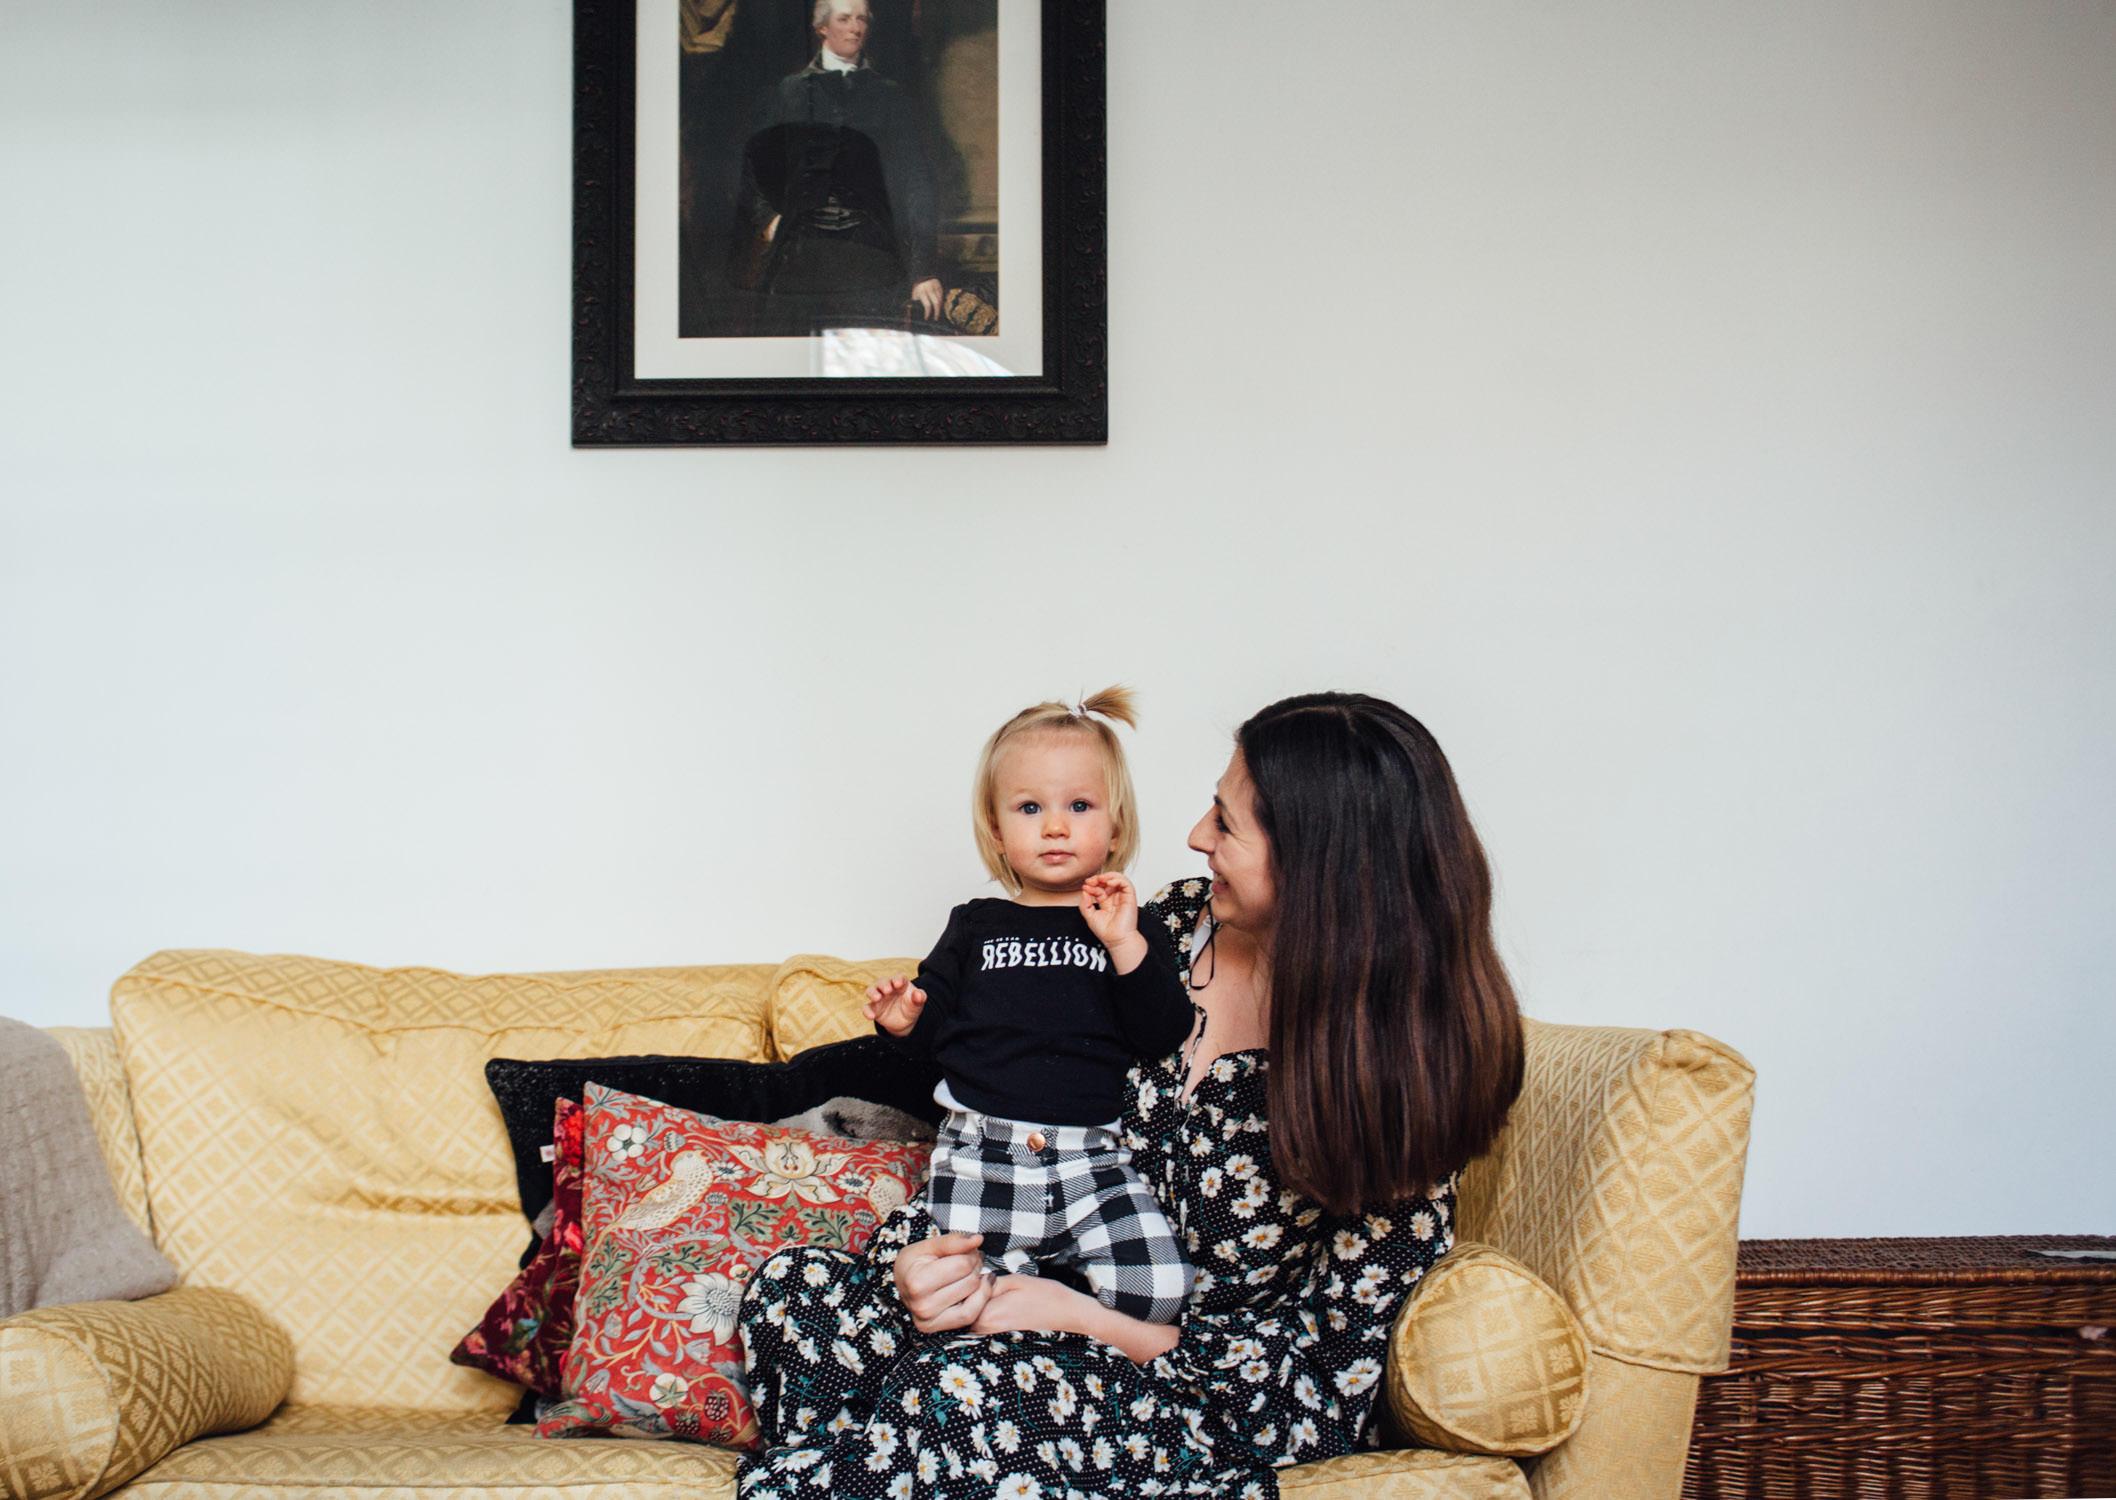 London Fields family photography | Franki + Malala in East London | SP